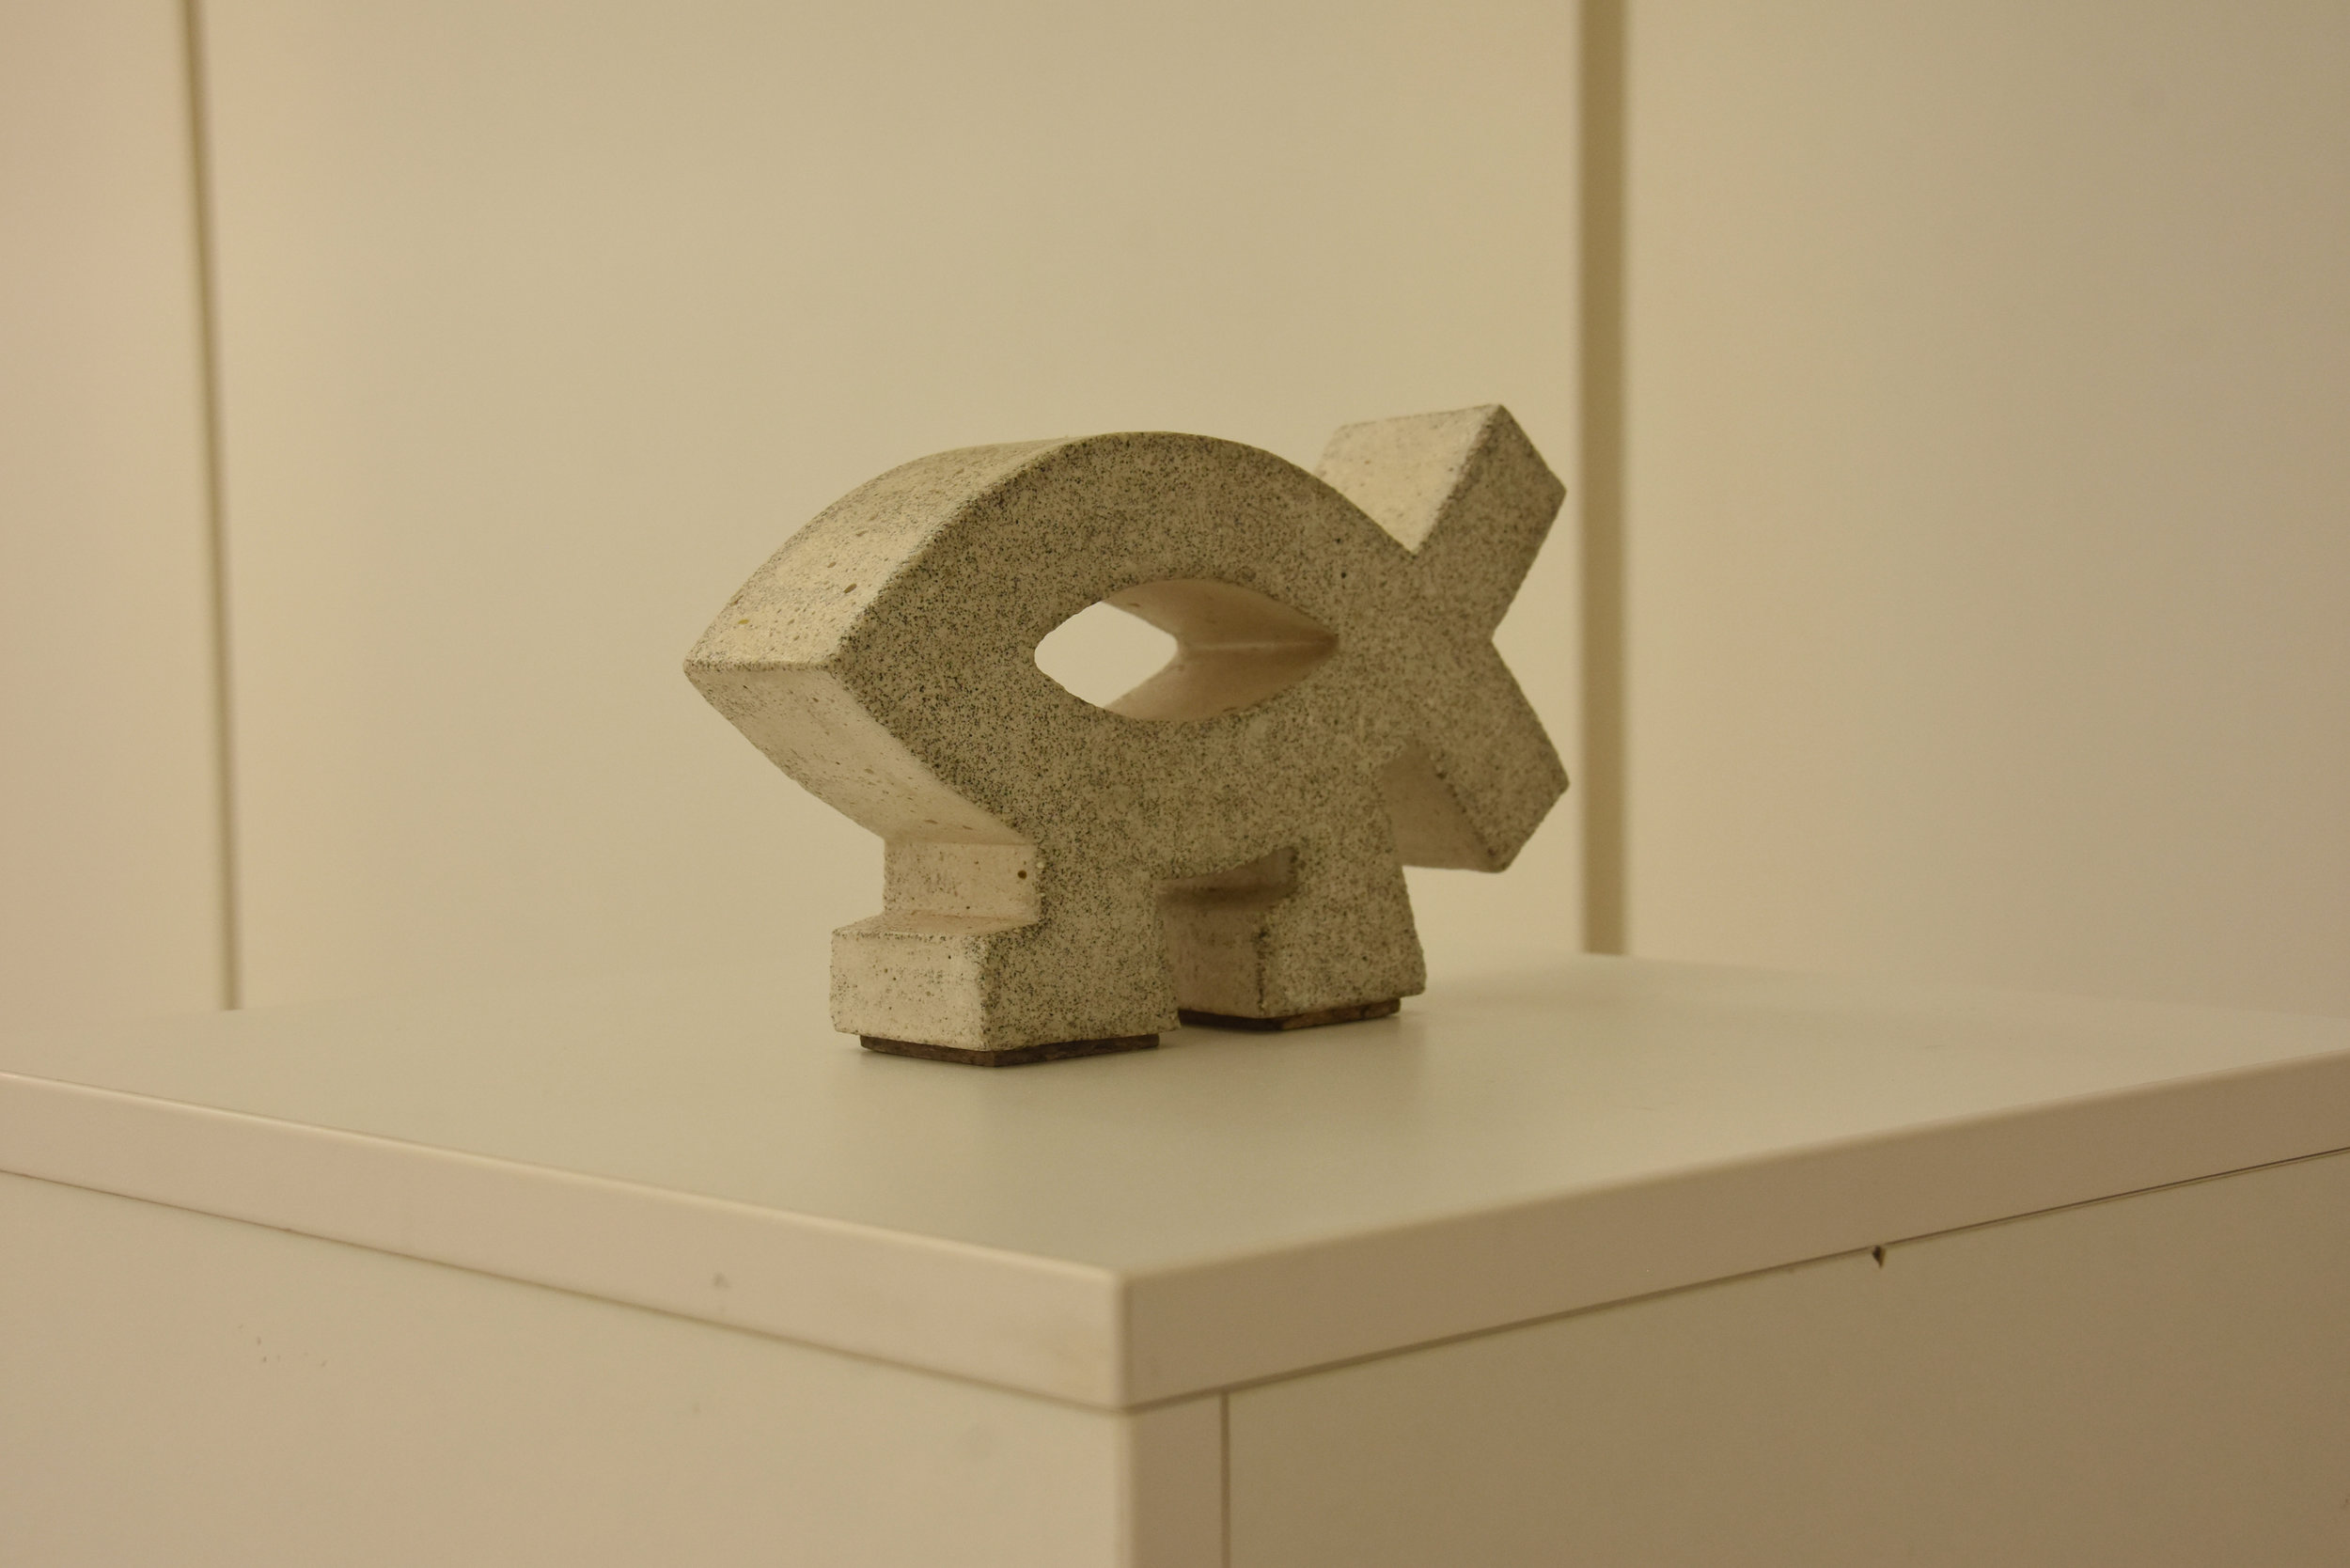 Скульптура Матвія Крилова